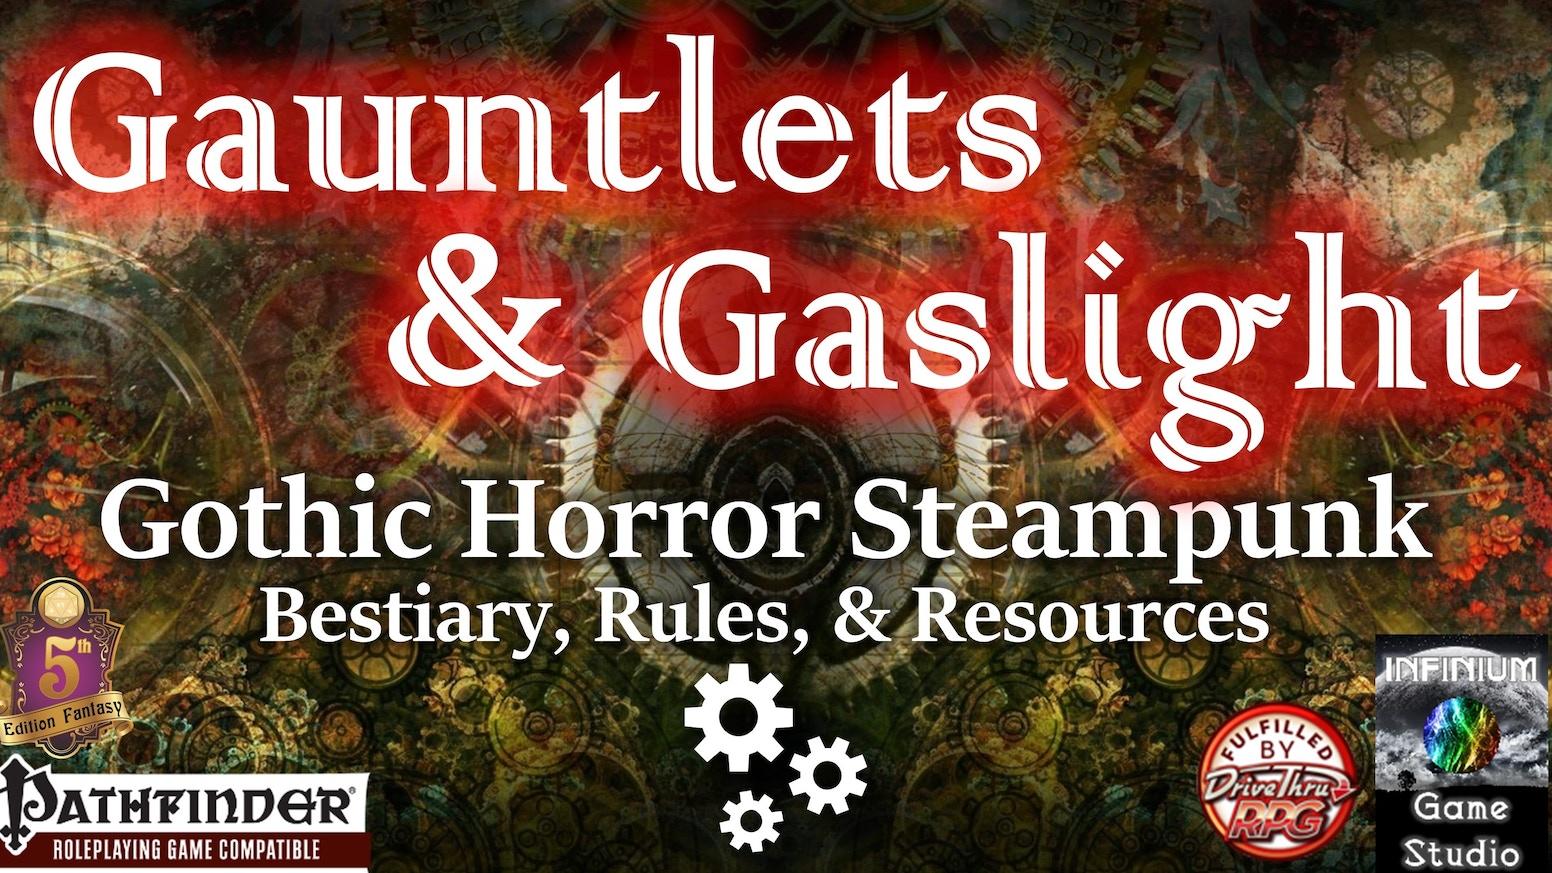 Gauntlets & Gaslight:Gothic Horror Steampunk, Pathfinder/5E by J